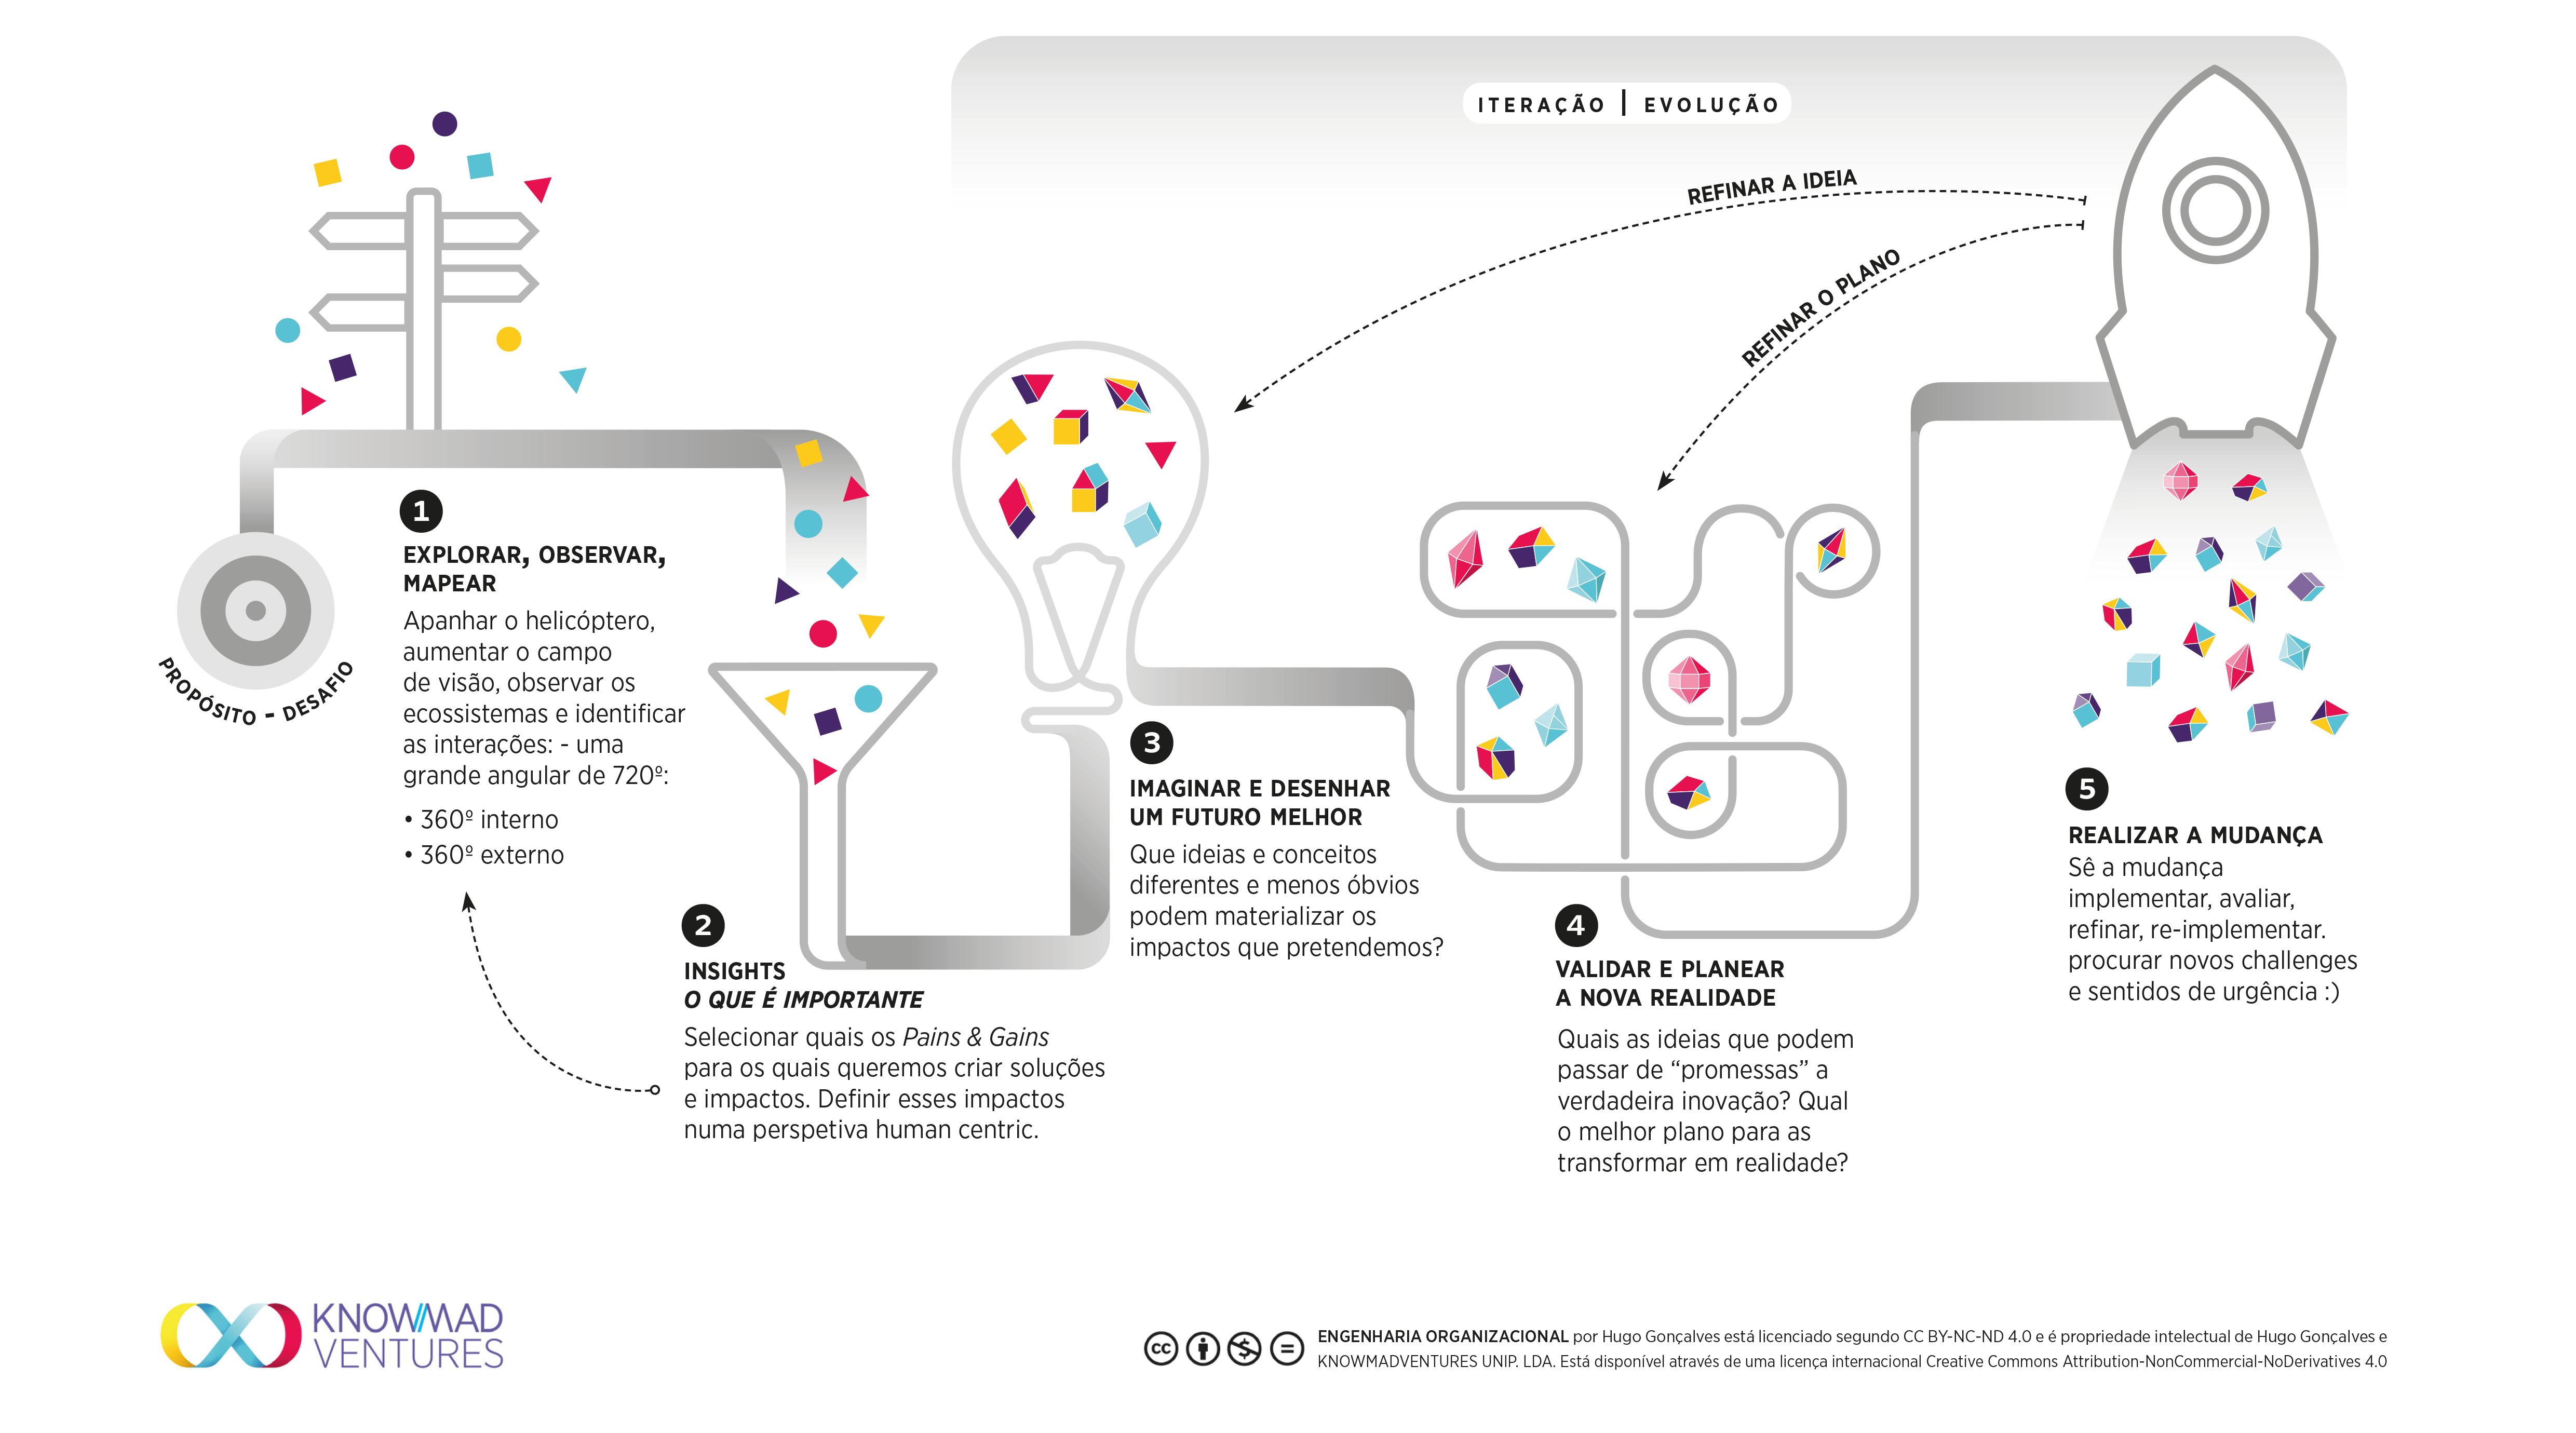 Engenharia Organizacional - Knowmad Ventures